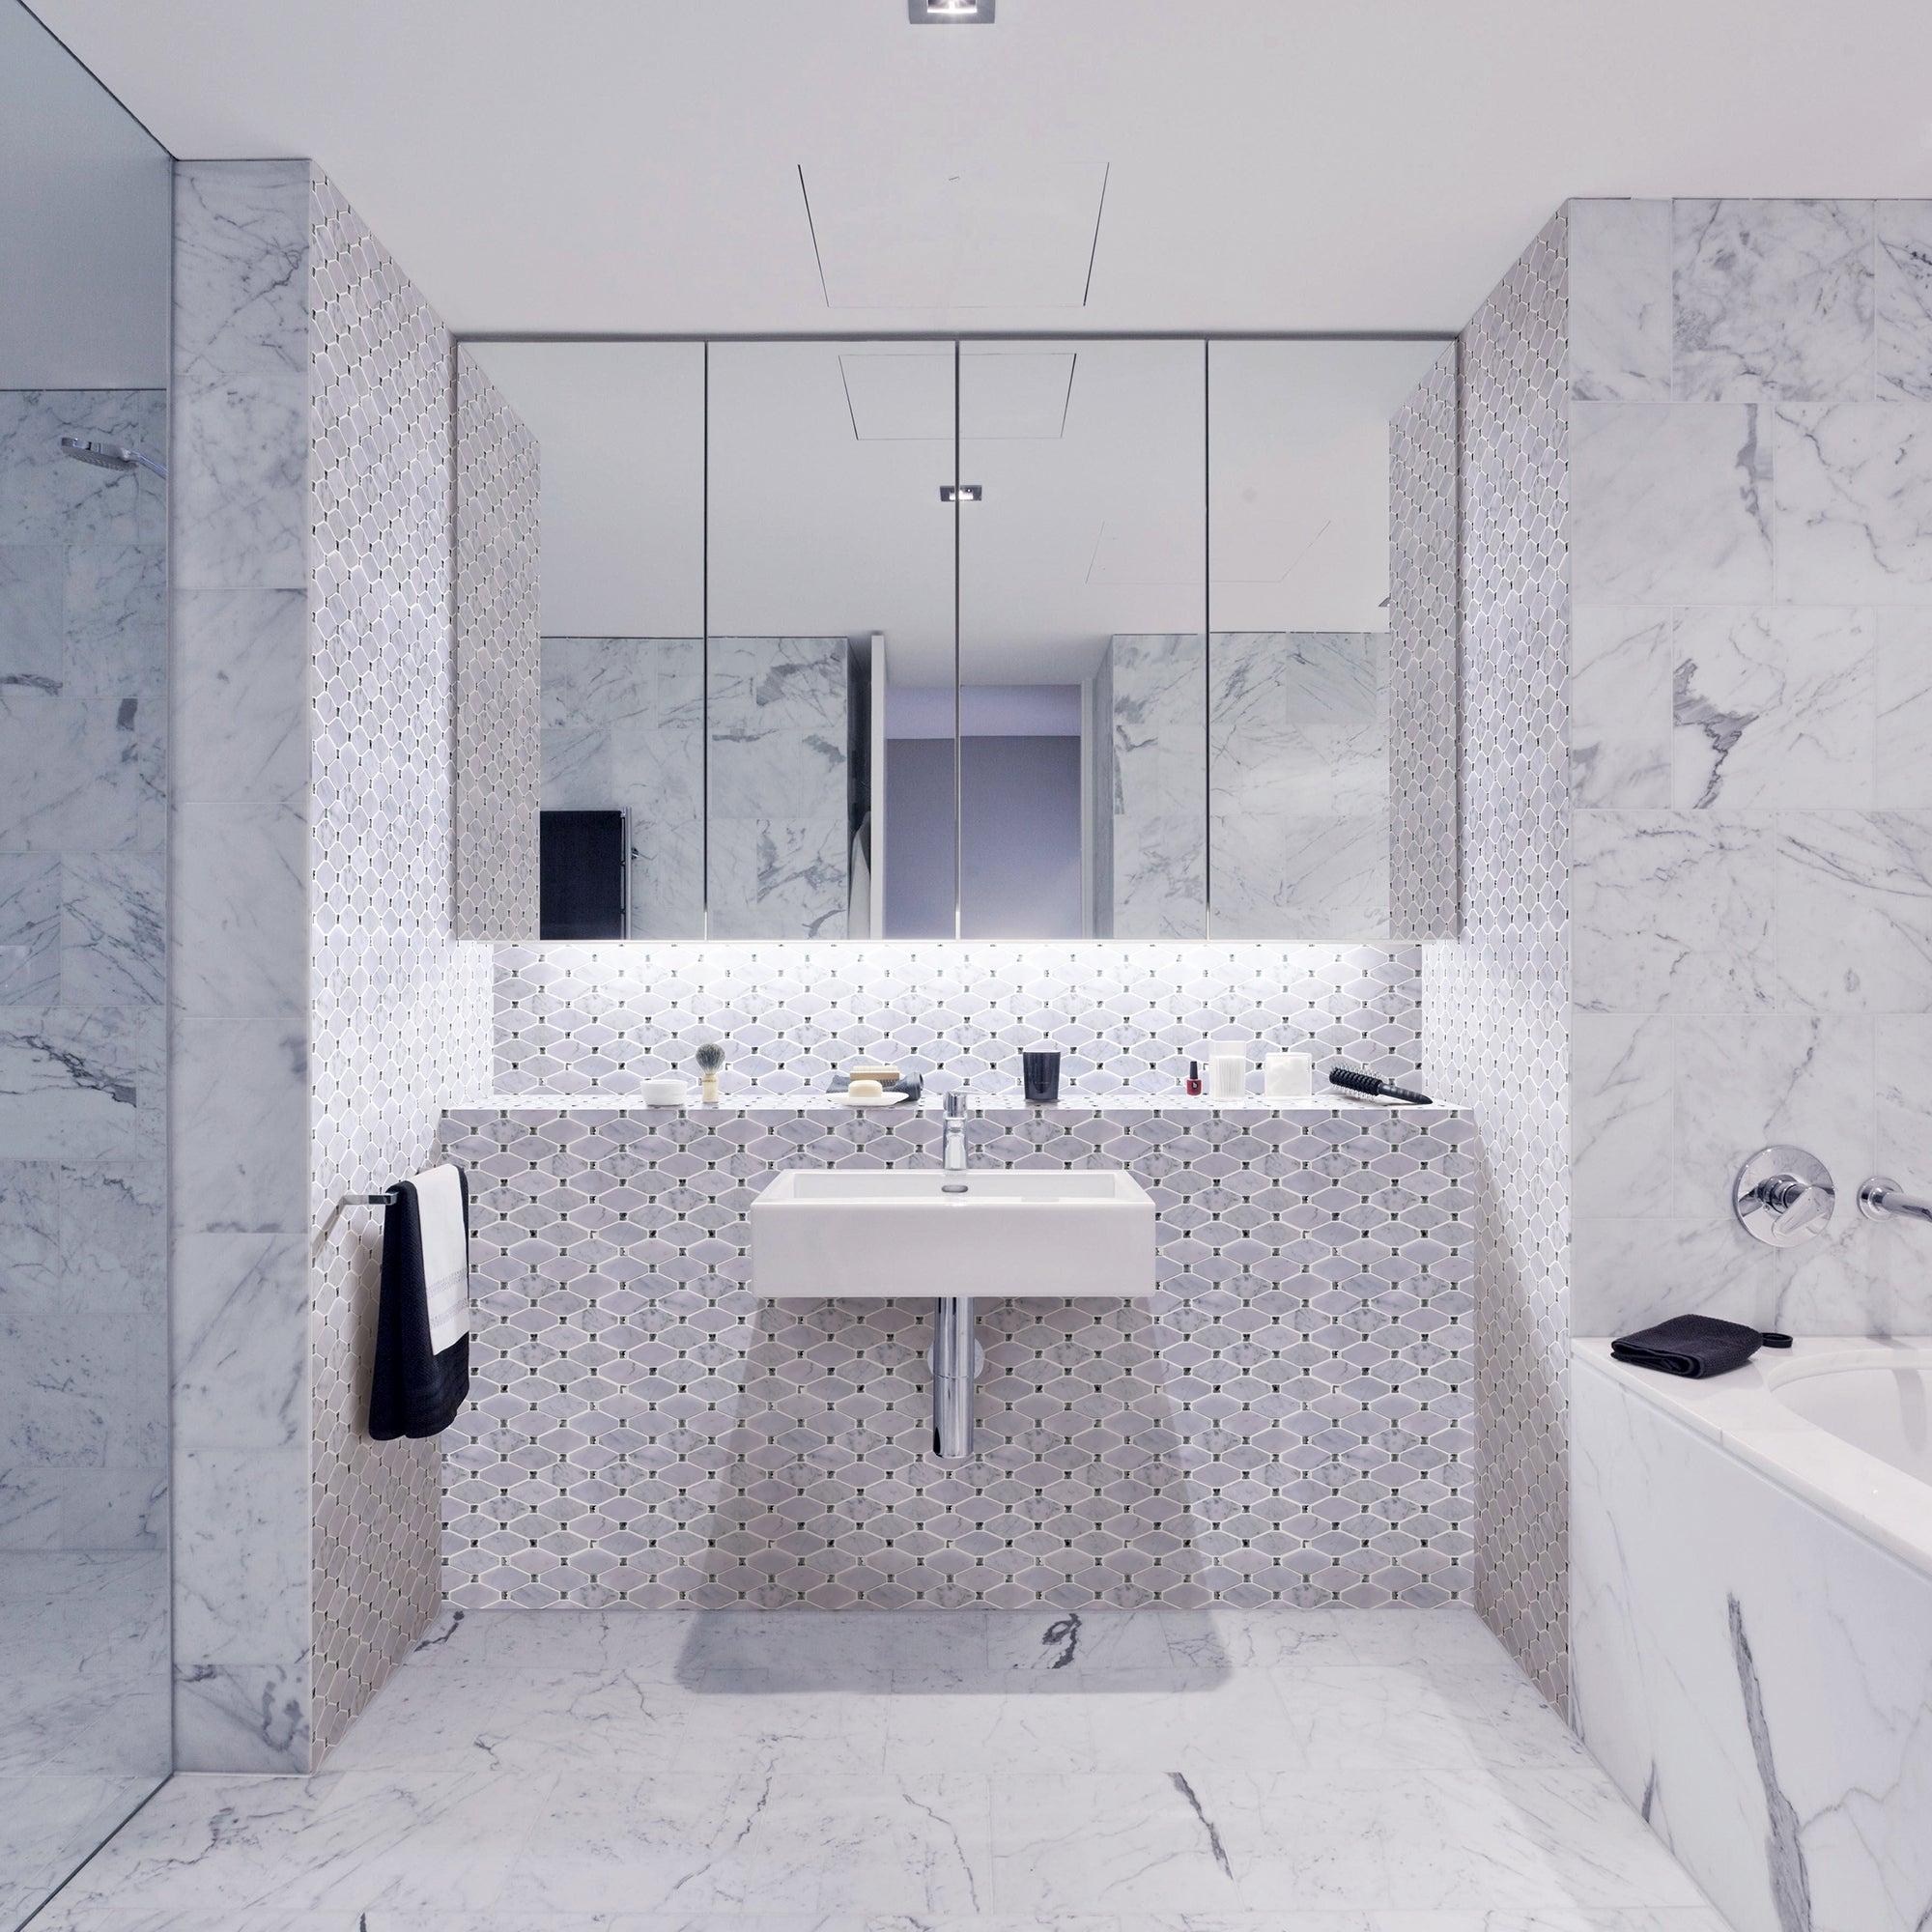 Tilegen Long Diamond Shape Cyrstal Marble Mosaic Tile In White Carrara Floor And Wall Tile 10 Sheets11sqft with measurements 2000 X 2000